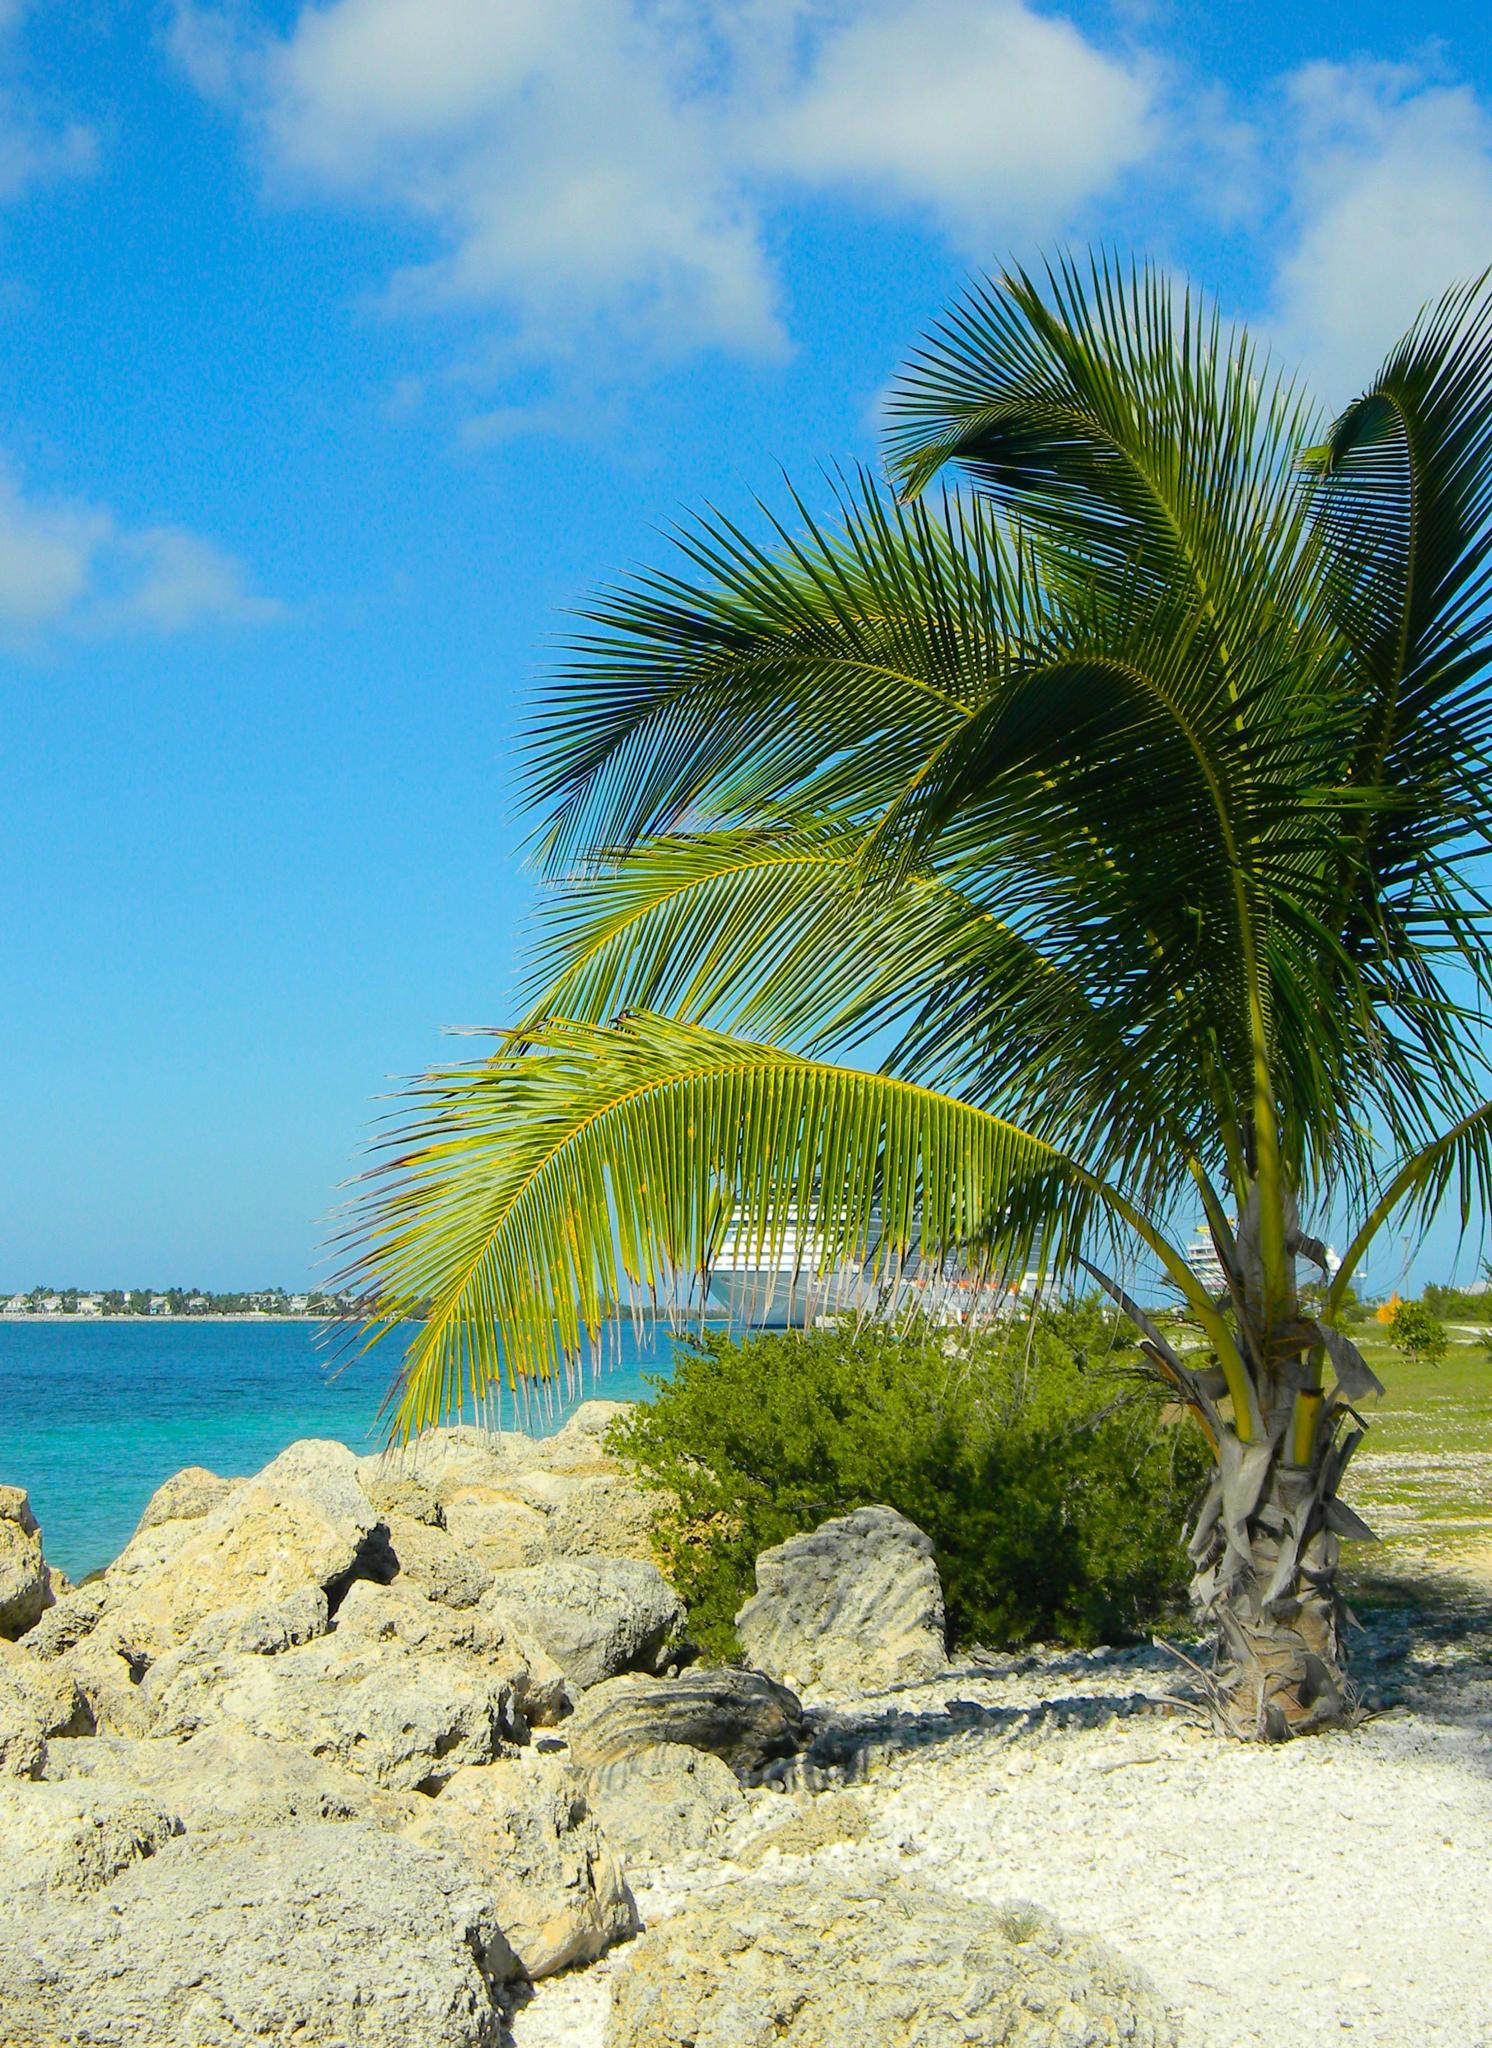 Summer Days at the Beach by Rhondasims